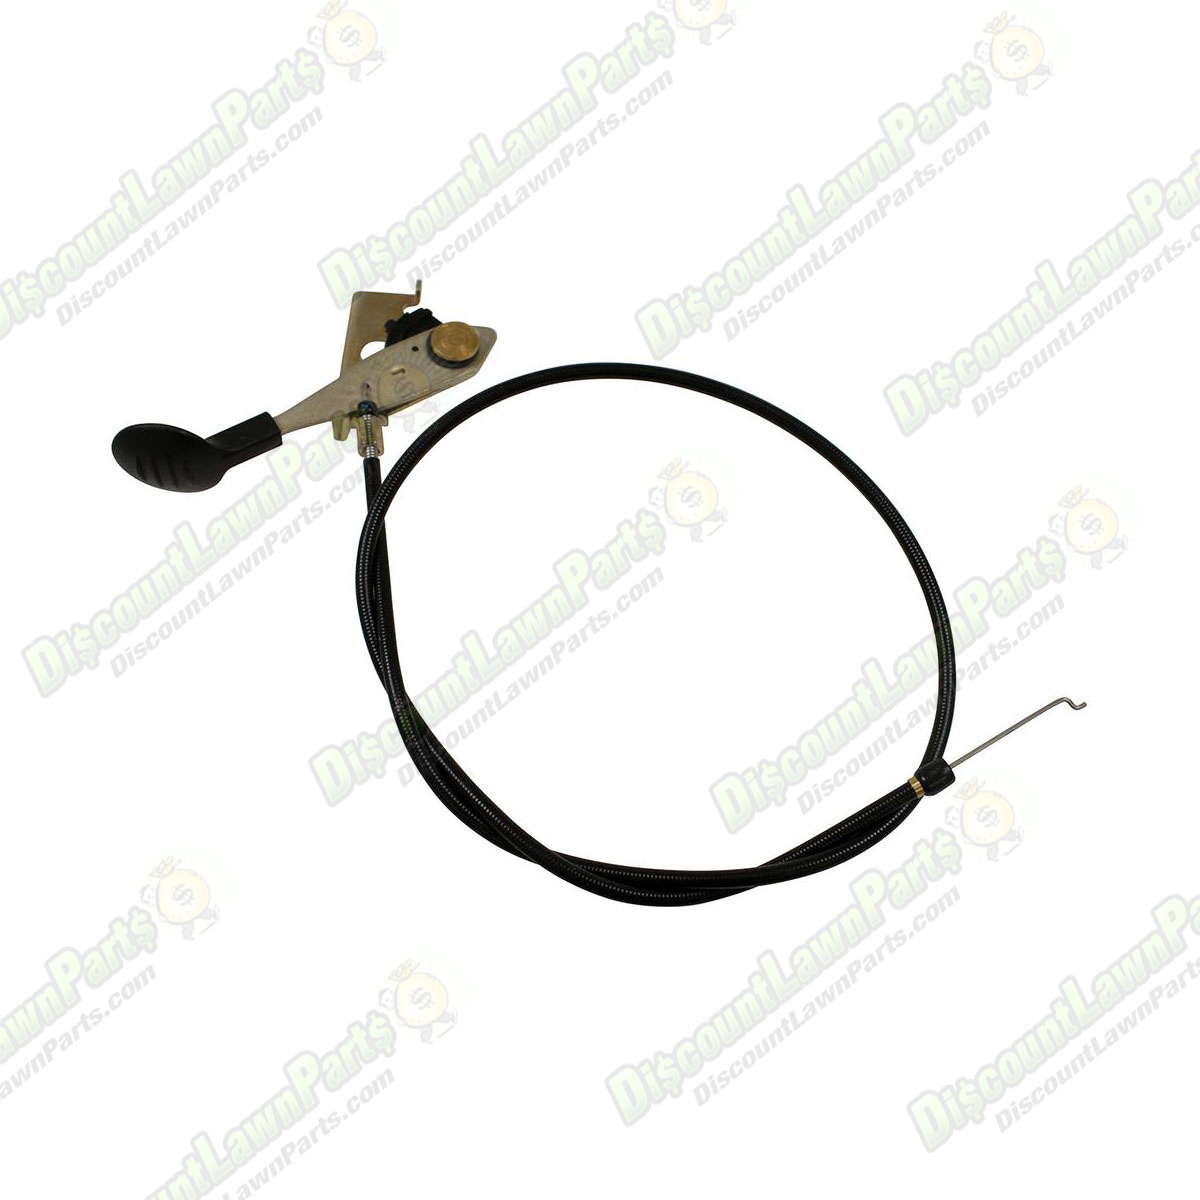 Choke Cable Exmark 109